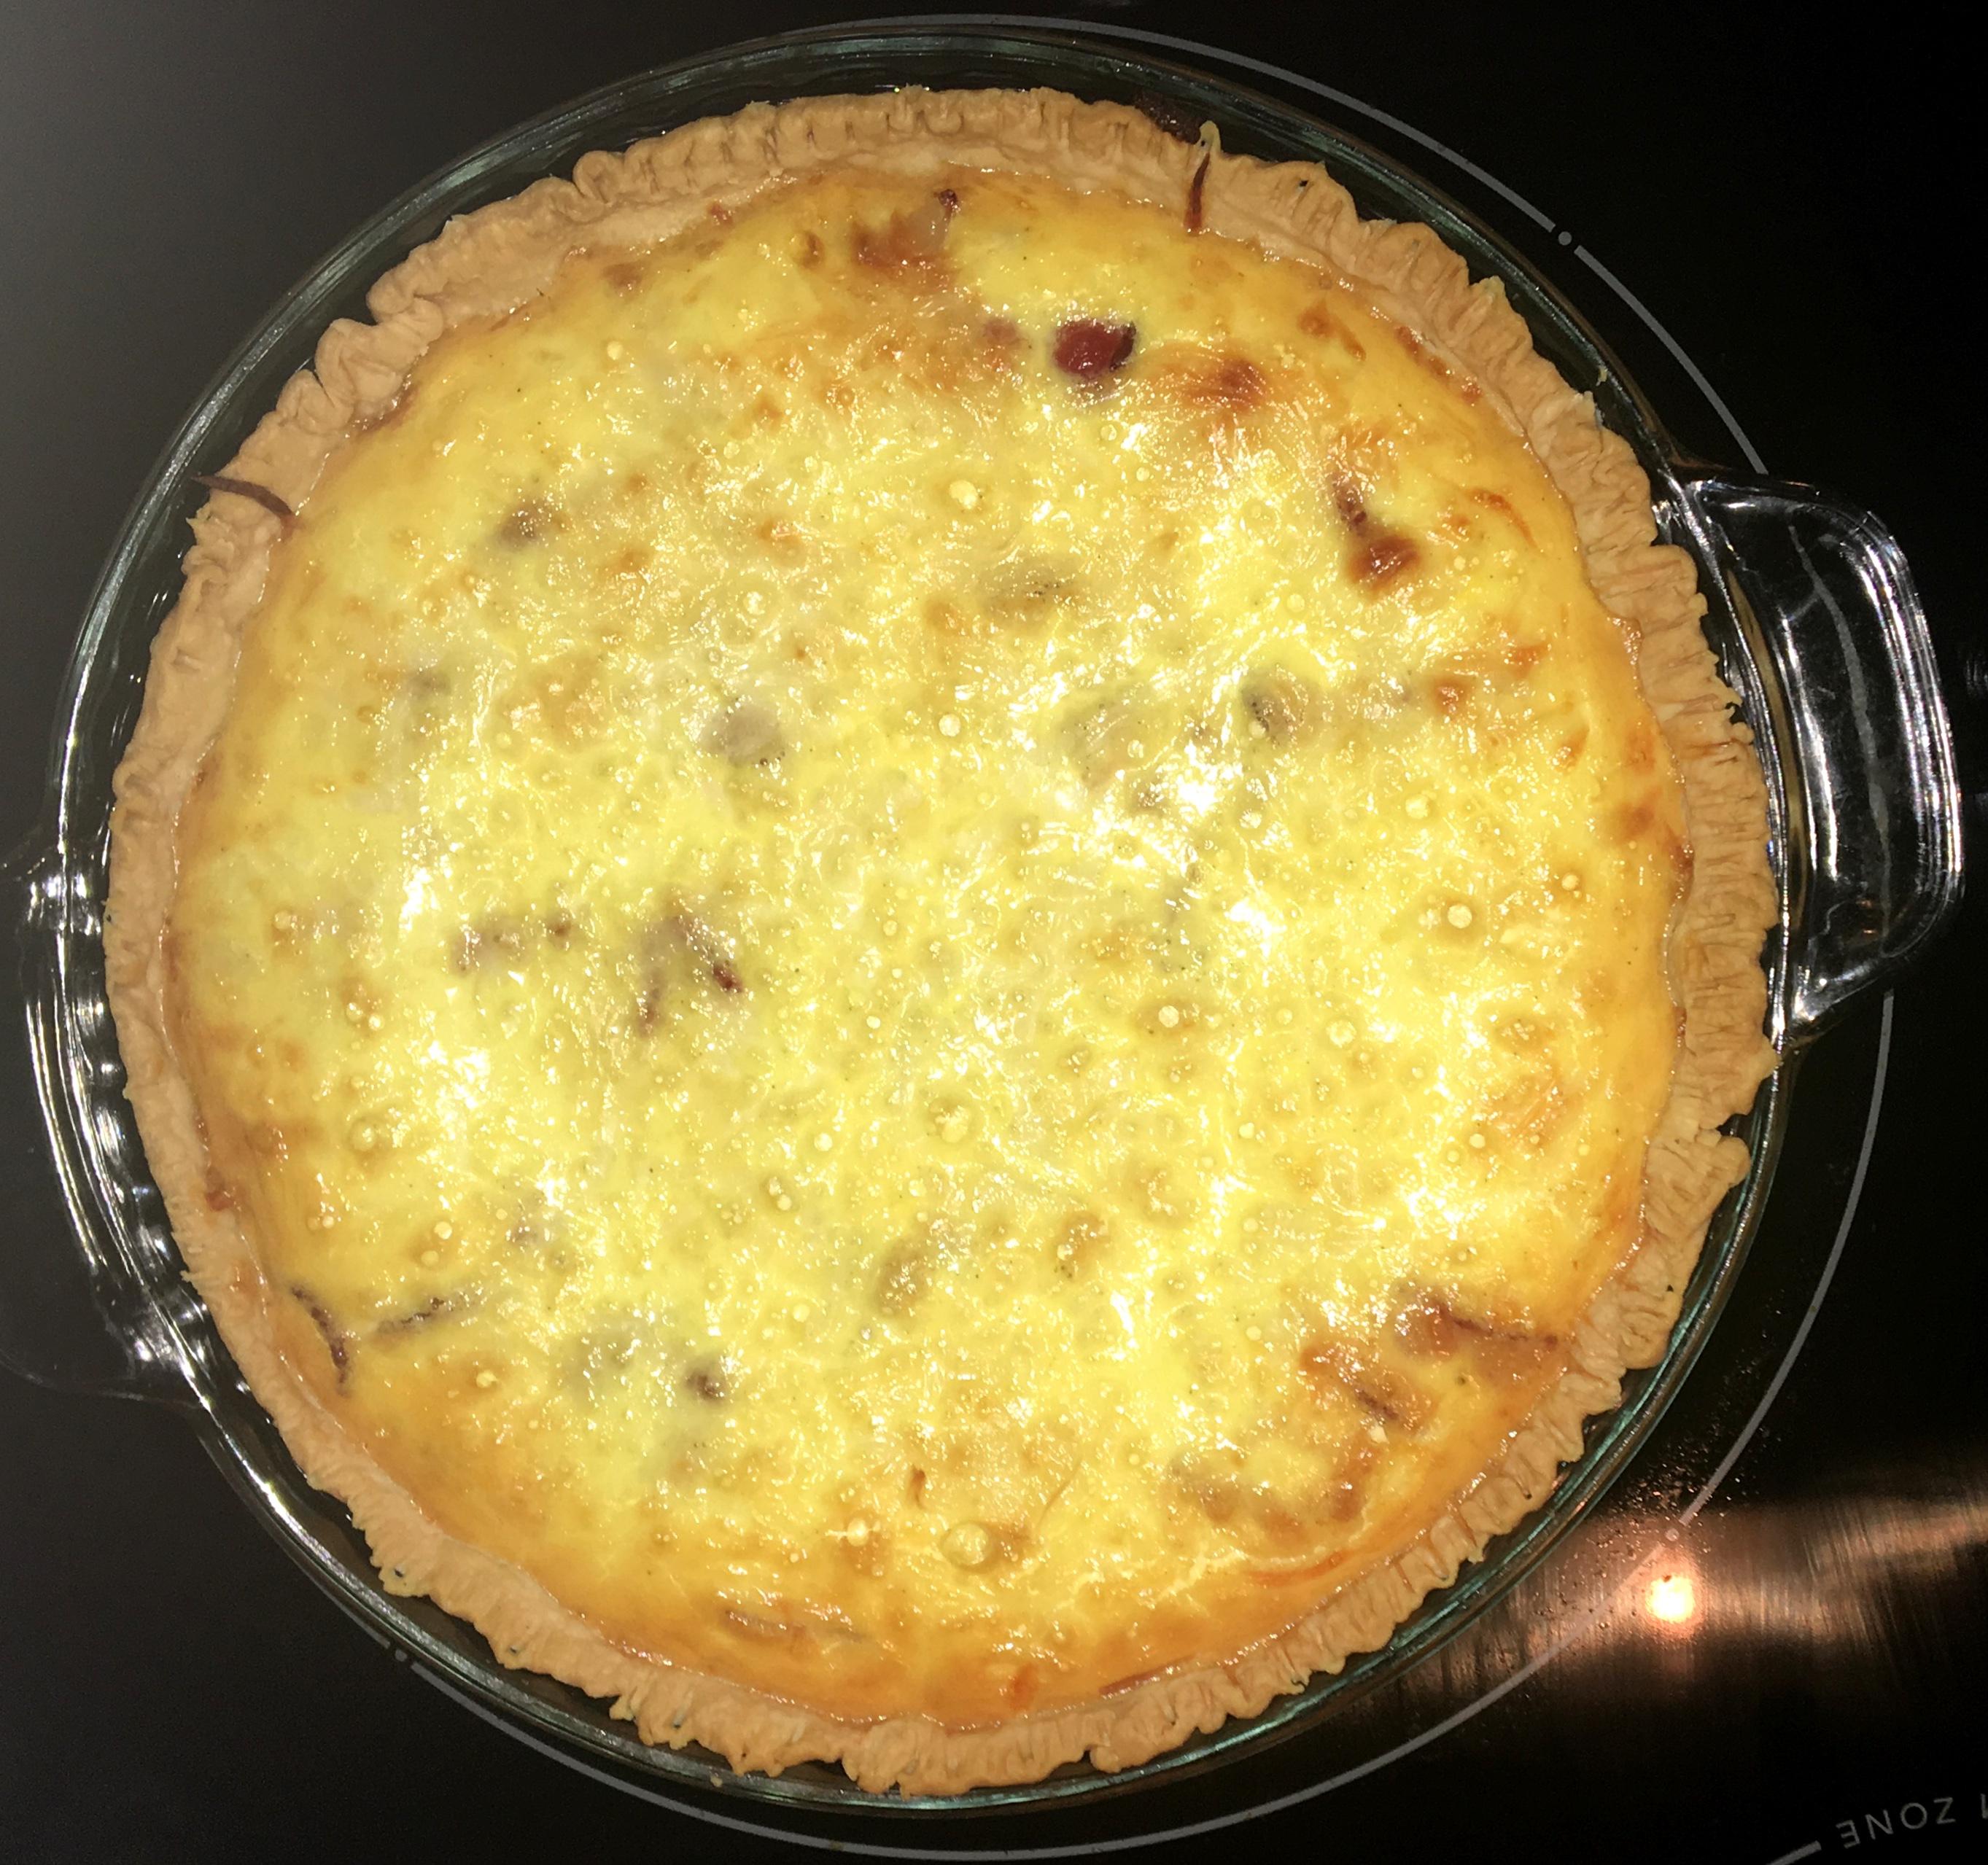 Chef John's Quiche Lorraine